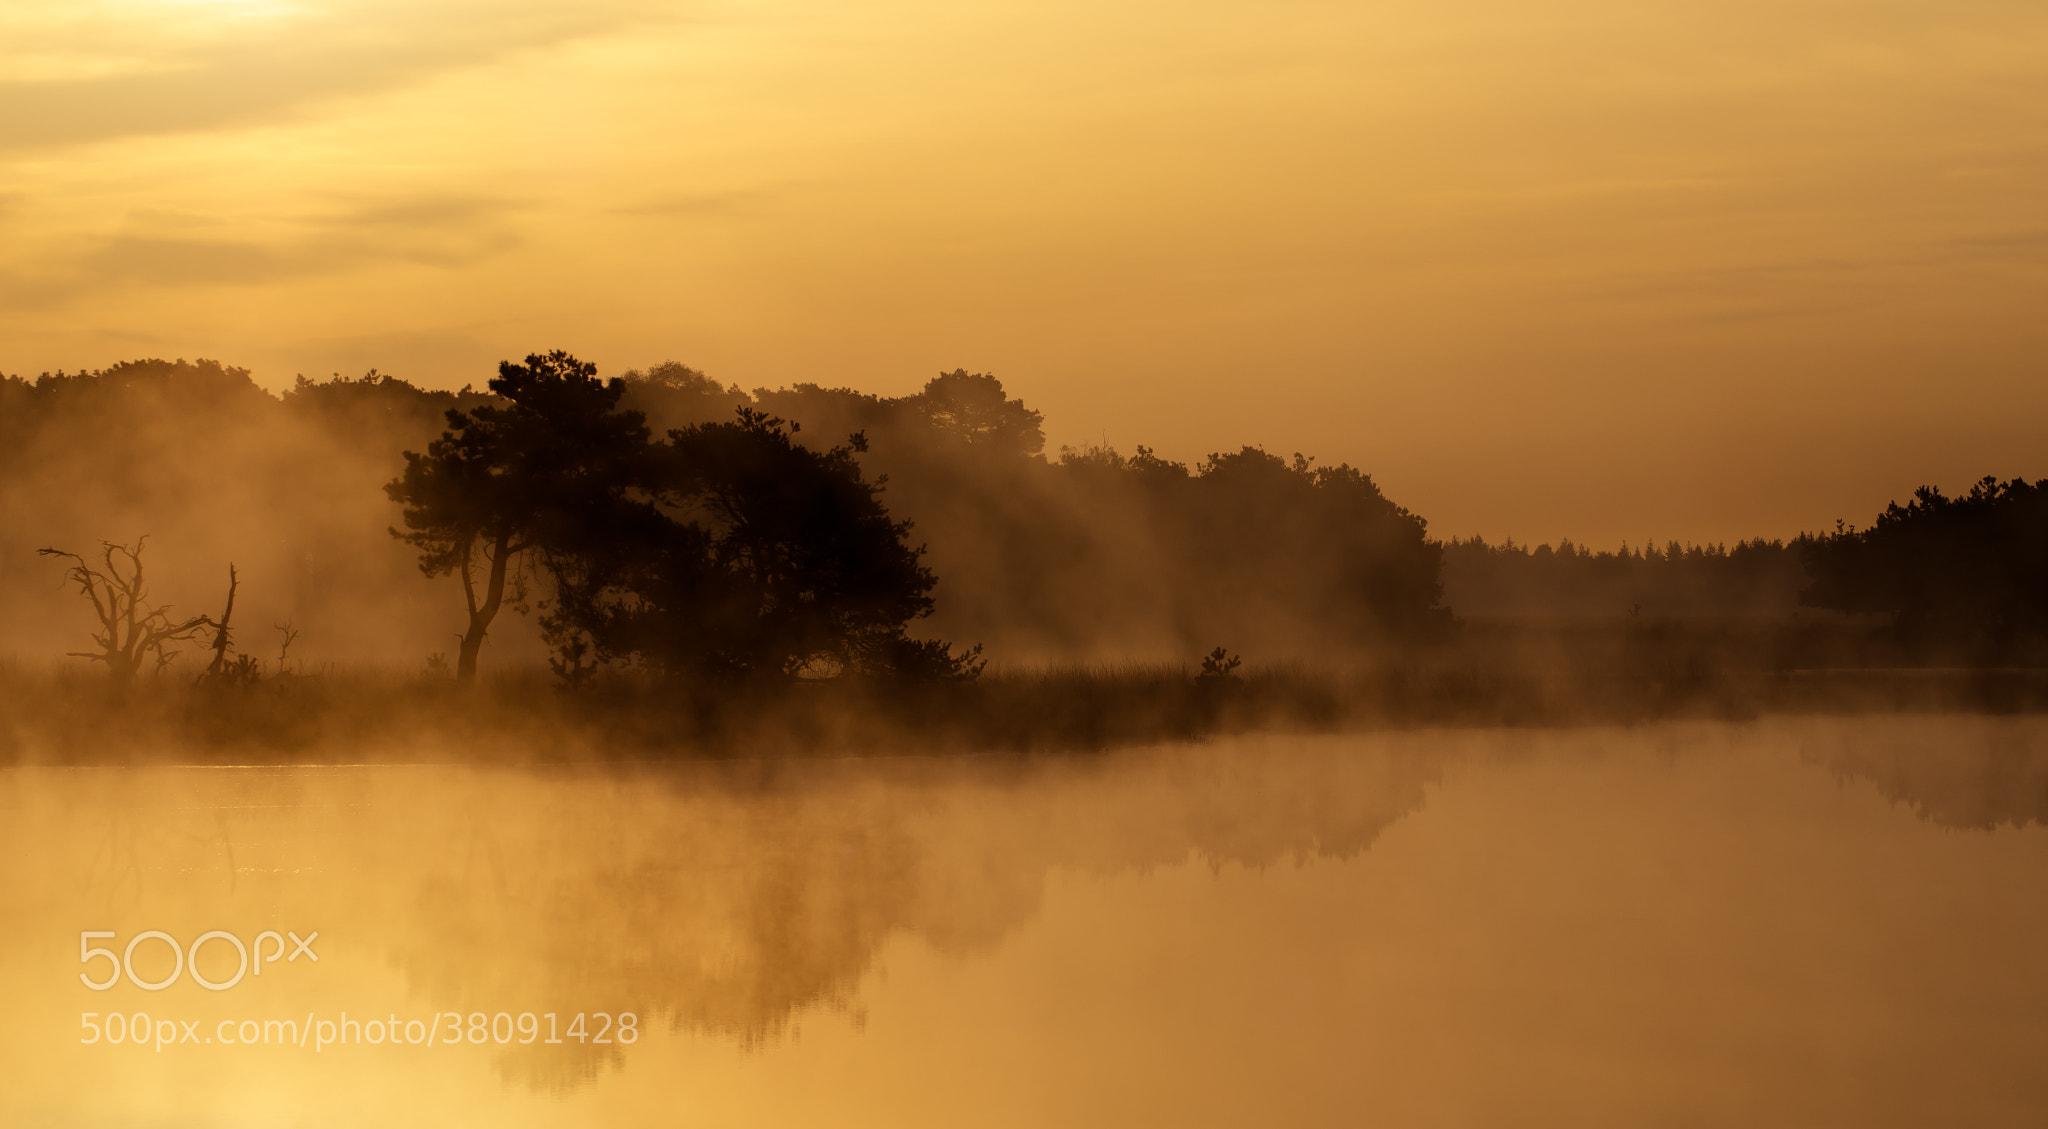 Photograph Strabrechtse Heide 110 by Mr. DESHAMER on 500px